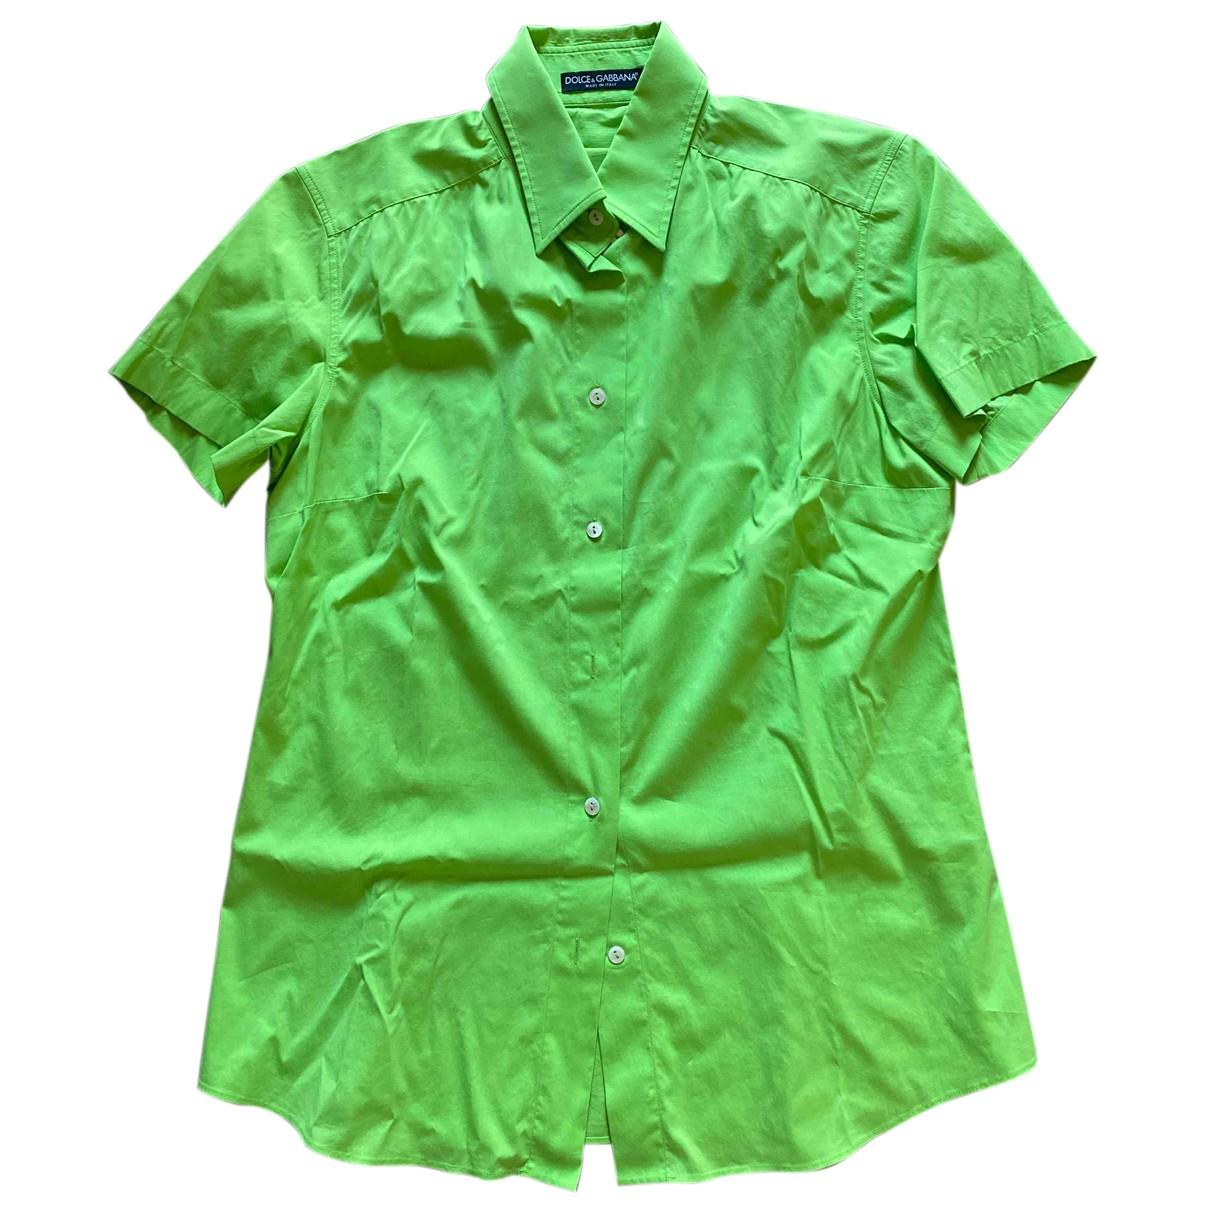 Dolce & Gabbana N Green Cotton  top for Women 46 IT